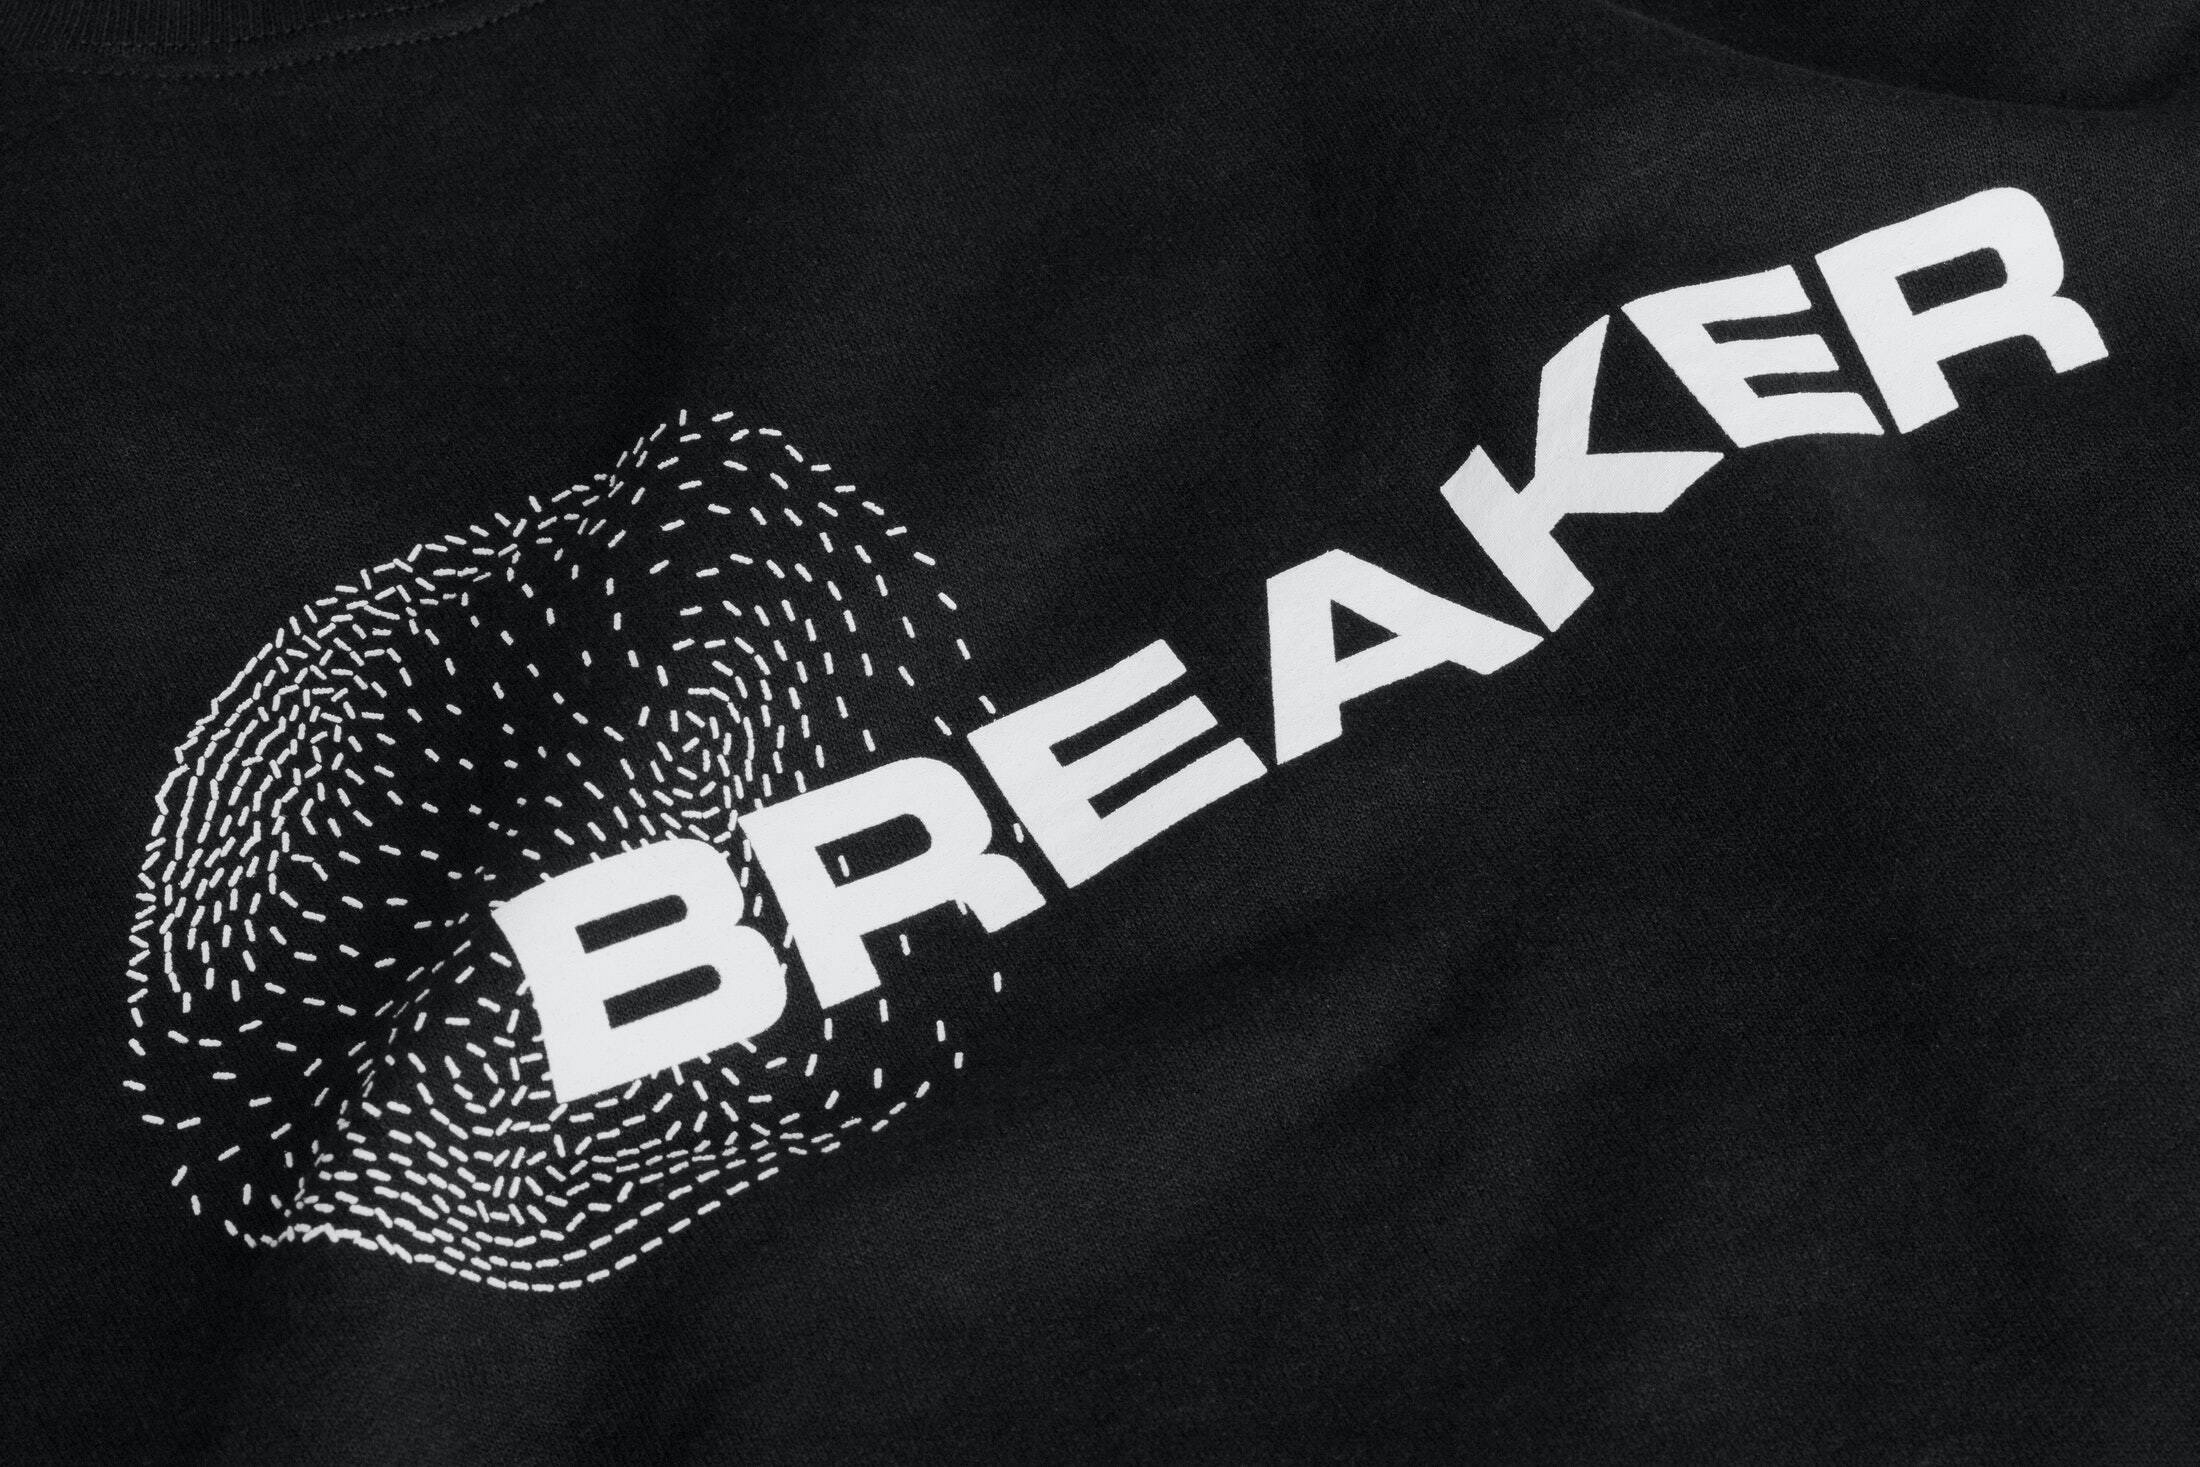 Breaker sweatshirt